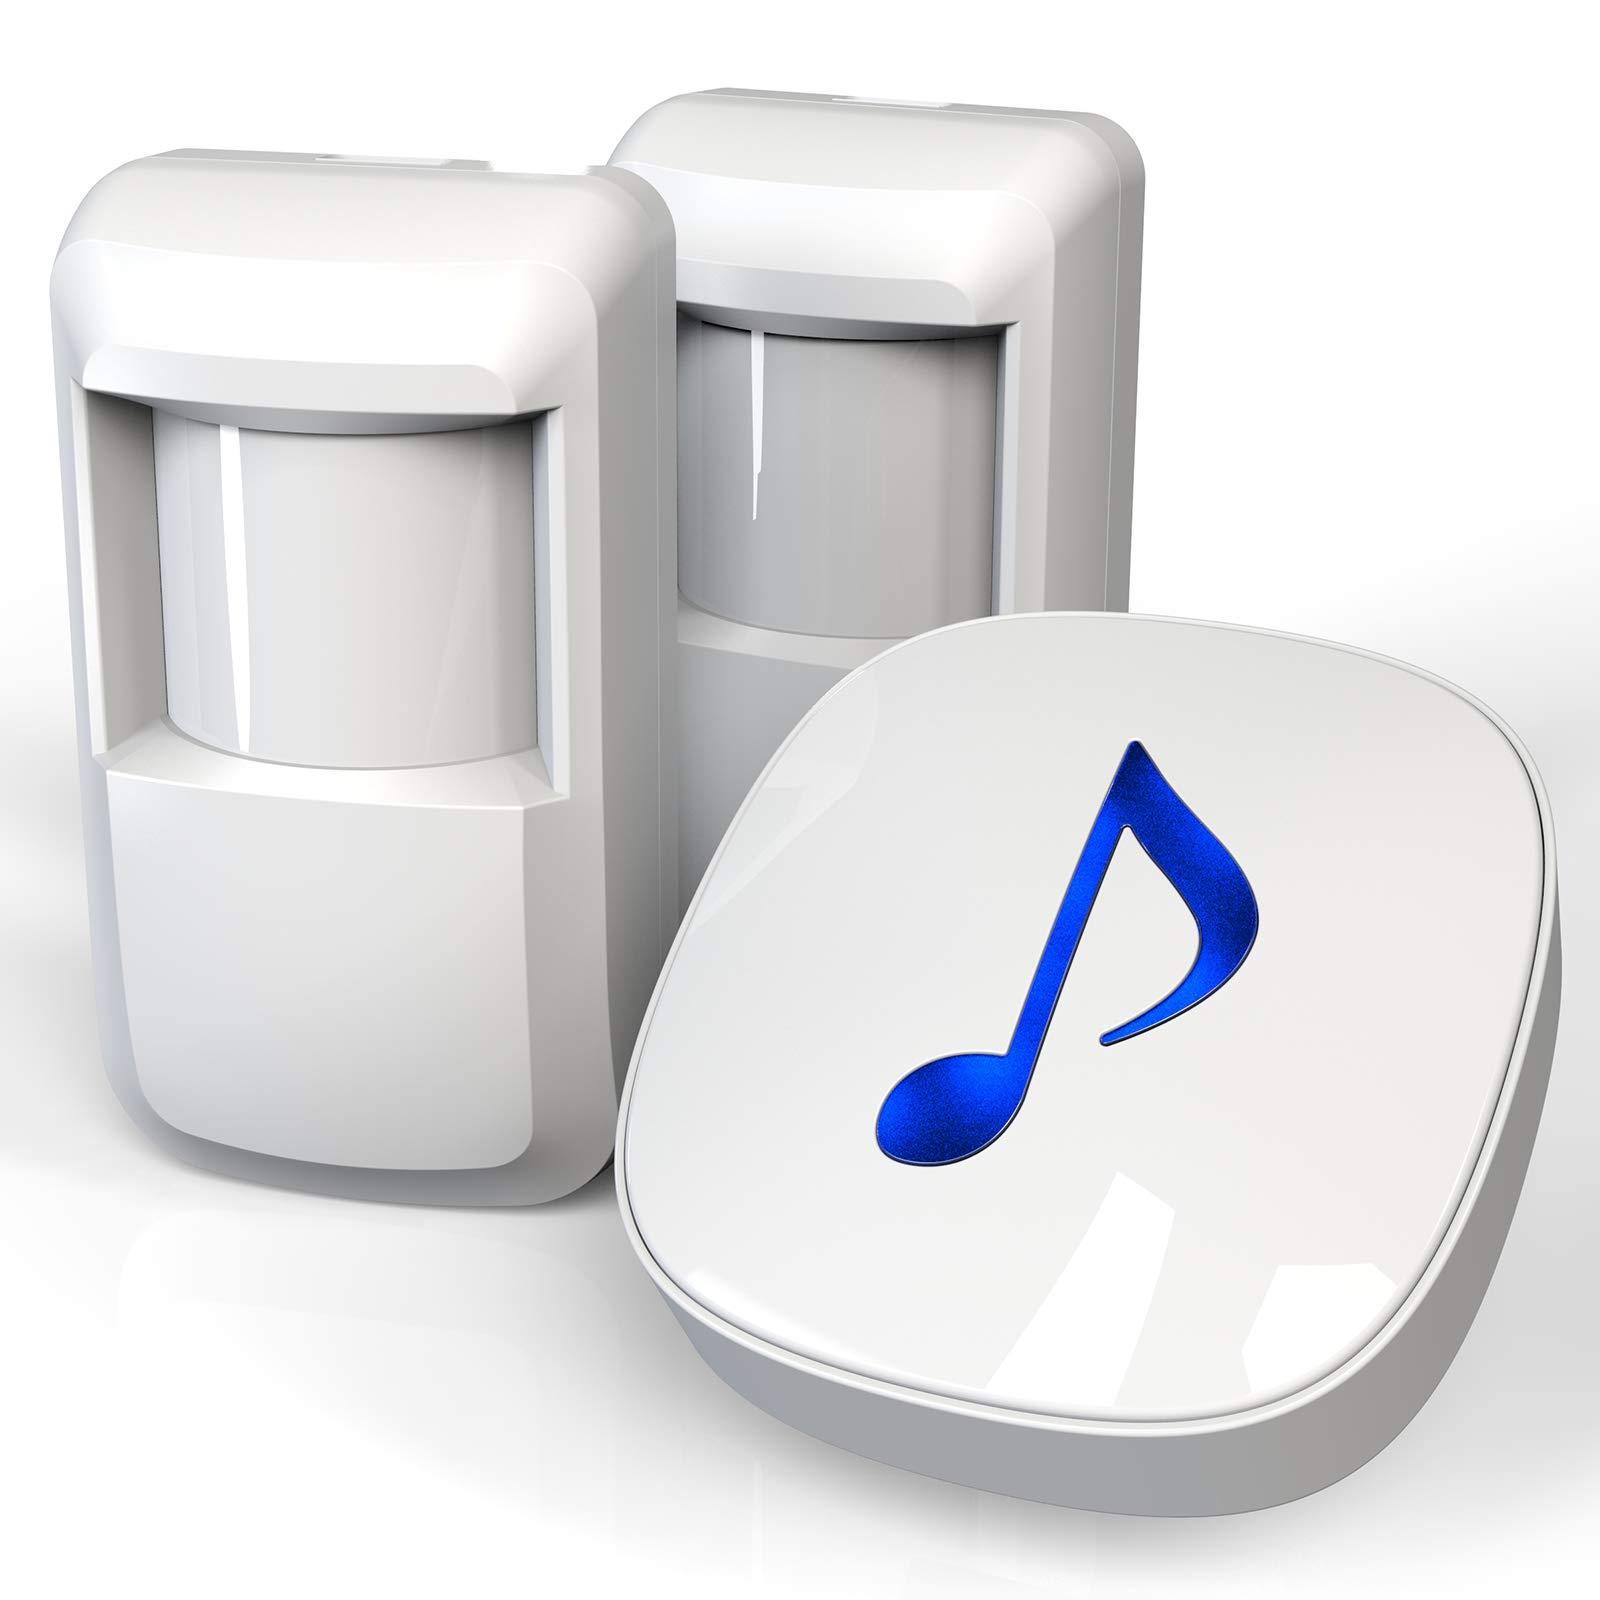 HTZSAFE Wireless Motion Sensor Alarm System-600 Feet Long Wireless Transmission Range-Home/Business DIY Burglar Alert Security System(The Sensors are Not Include The Batteries)